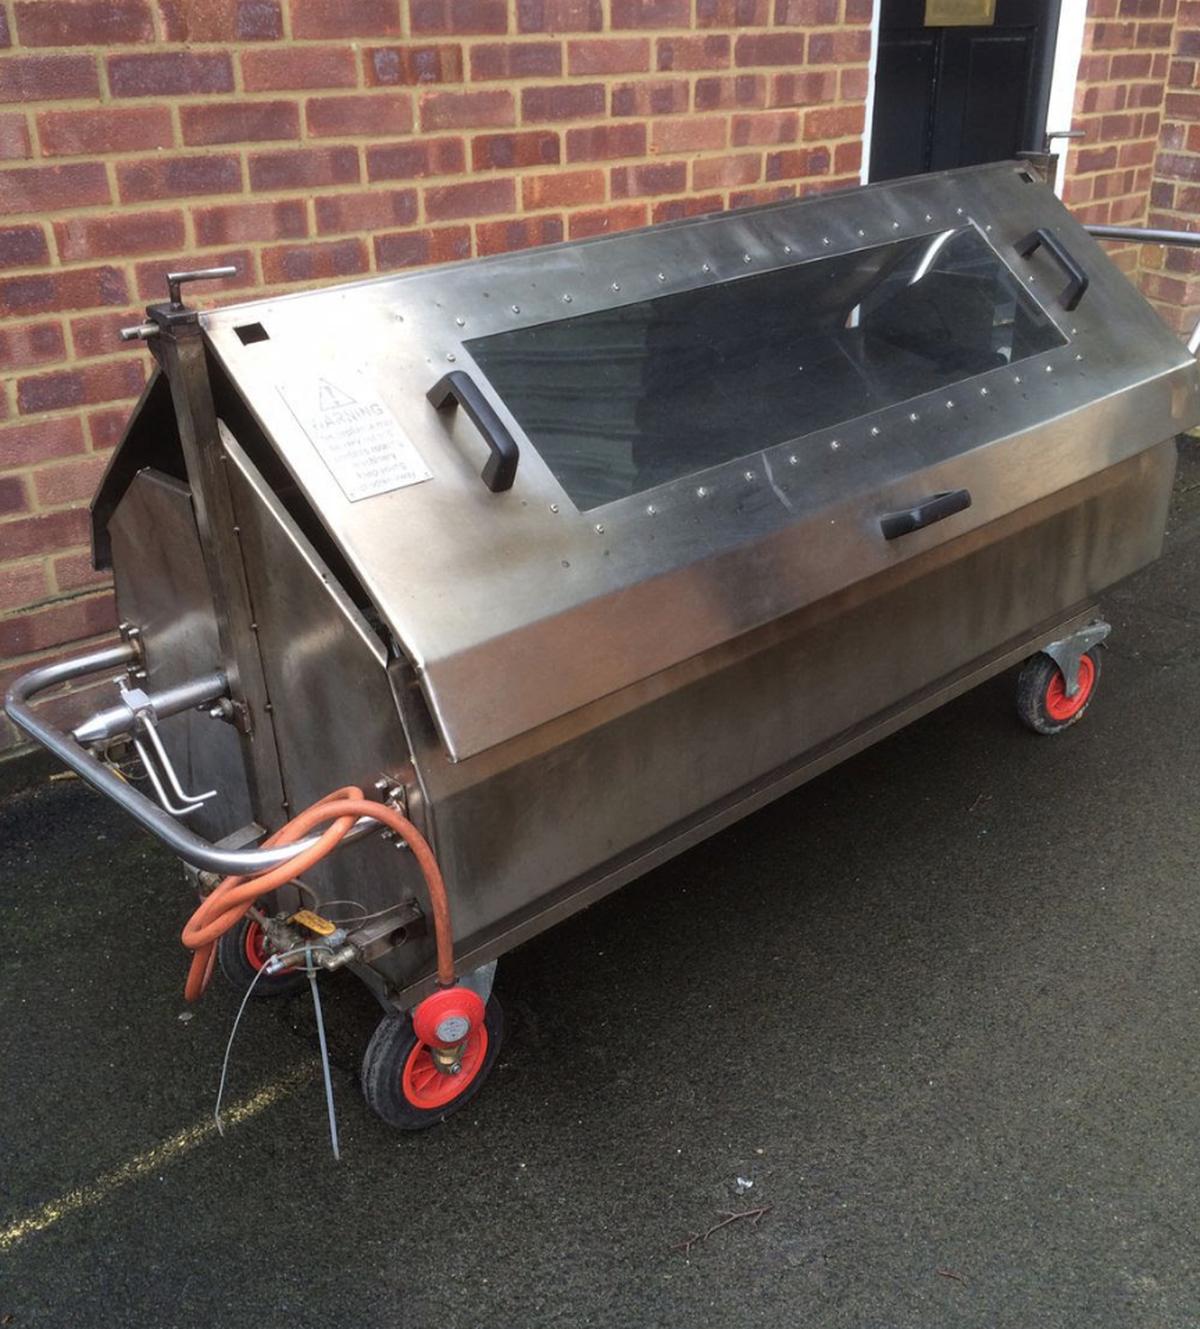 Farnham Van Sales Used Cars In Surrey: Secondhand Catering Equipment